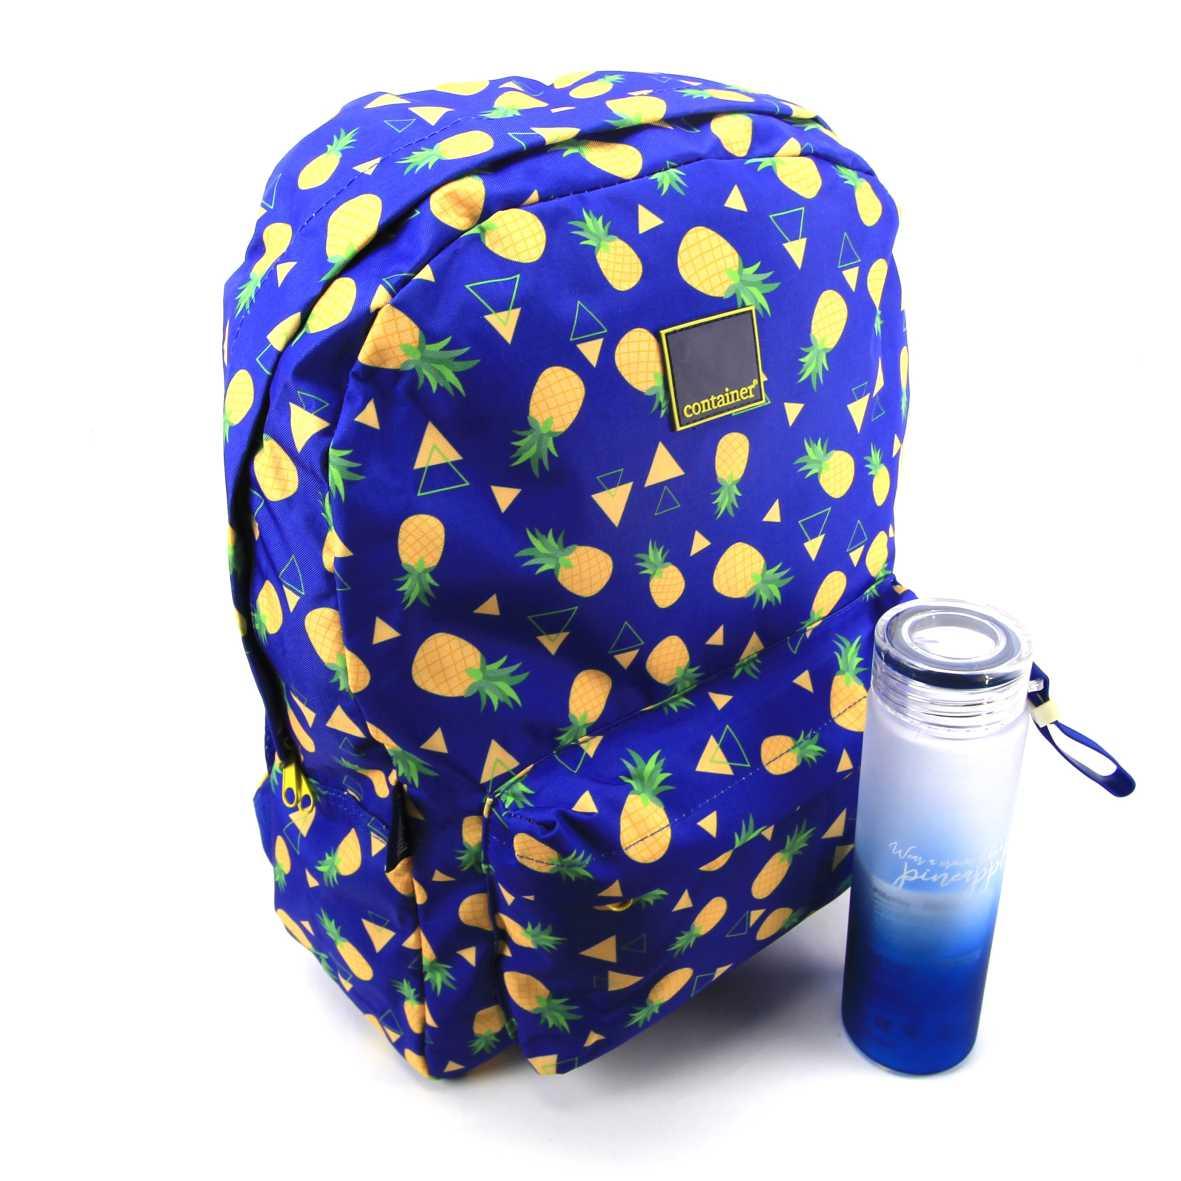 Mochila Pineapple Container com Garrafa Plástica Dermiwil 37726